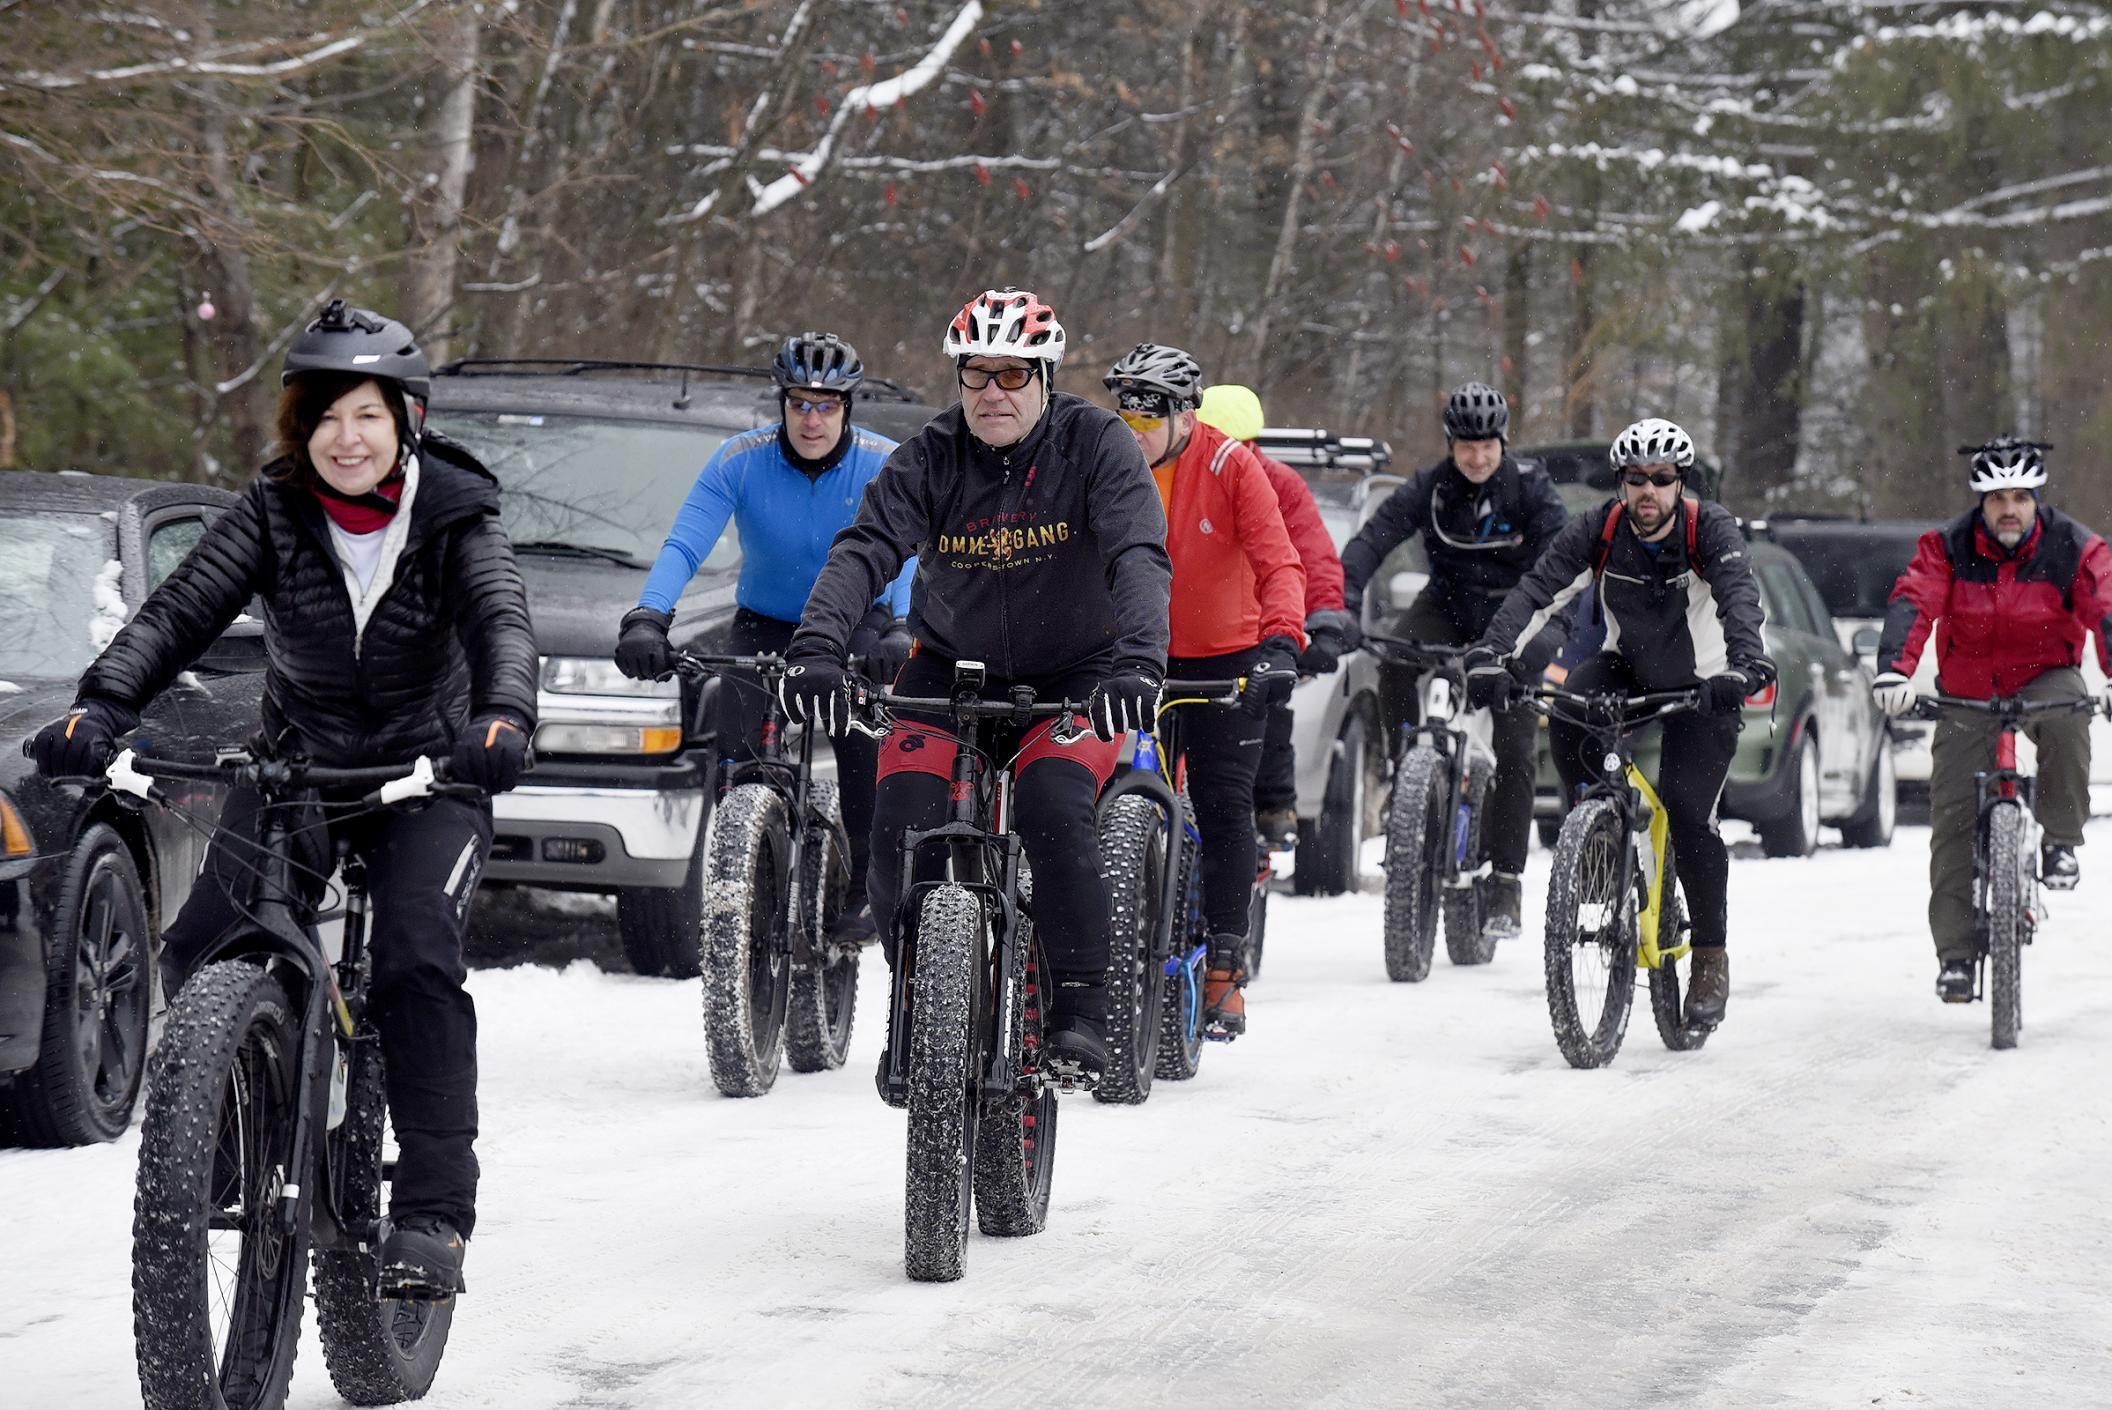 Saratoga Fat Bike Rally | The Daily Gazette